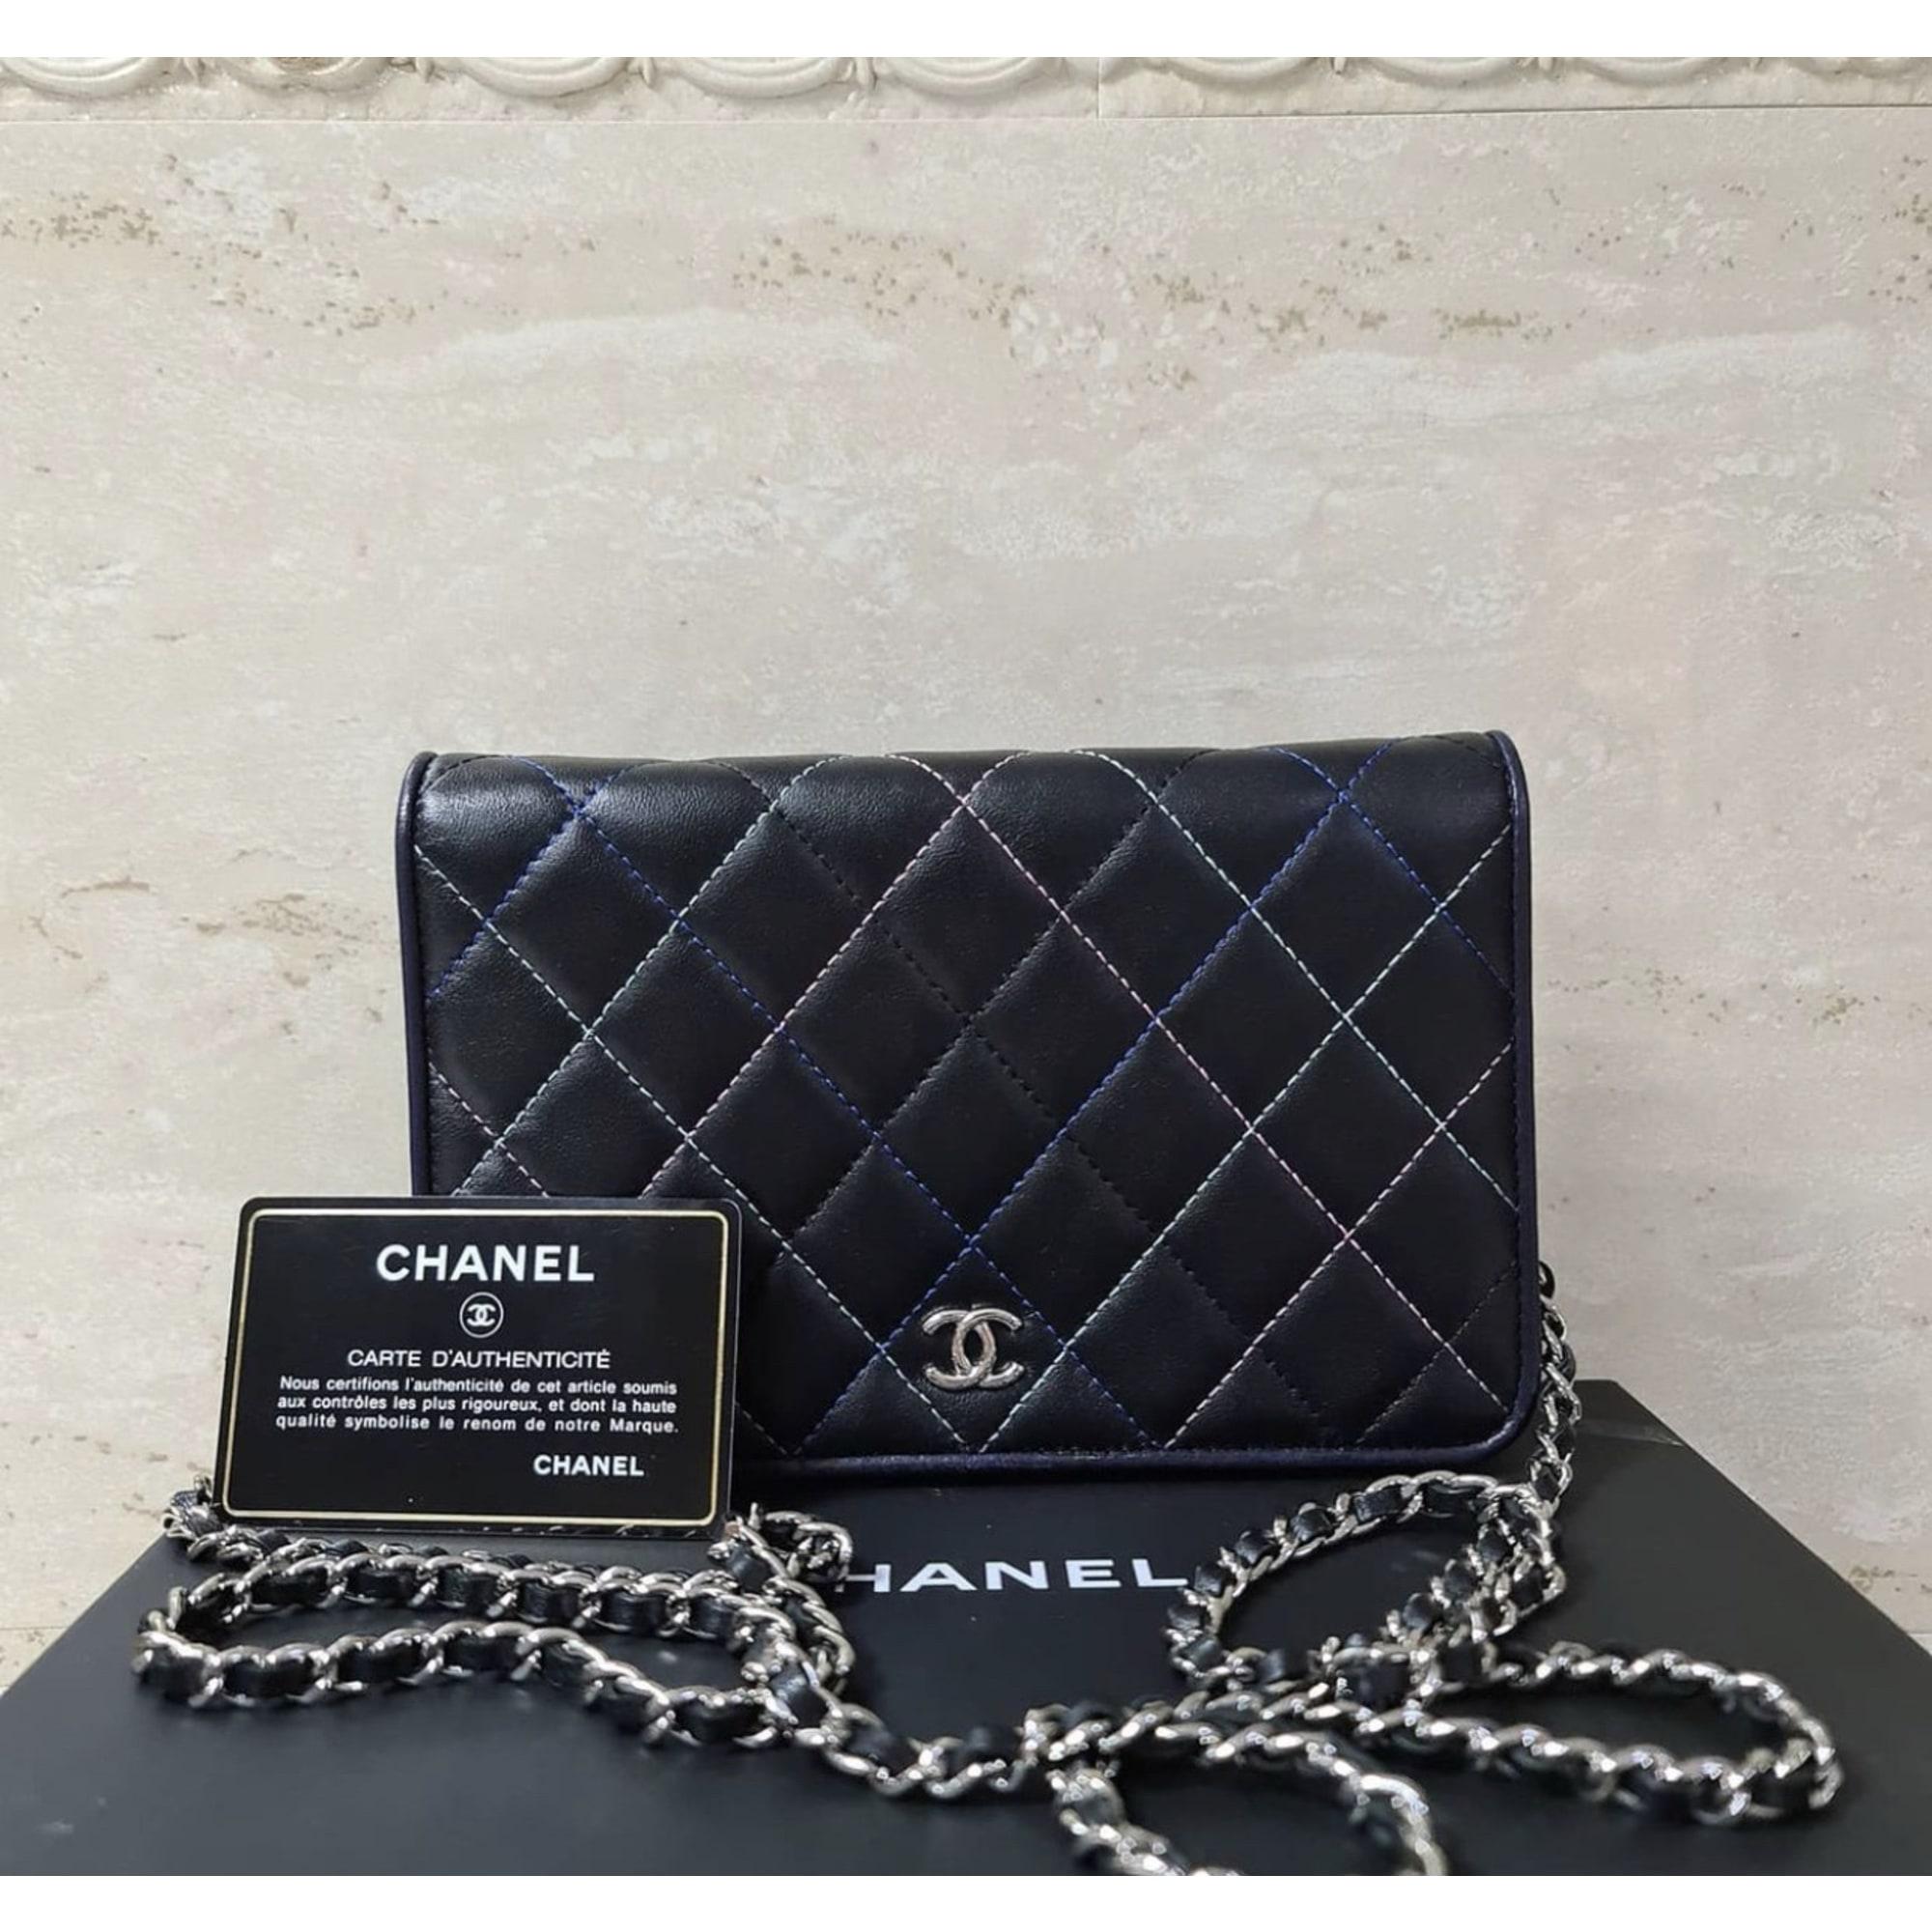 Sac en bandoulière en cuir CHANEL Wallet-On-Chain Noir